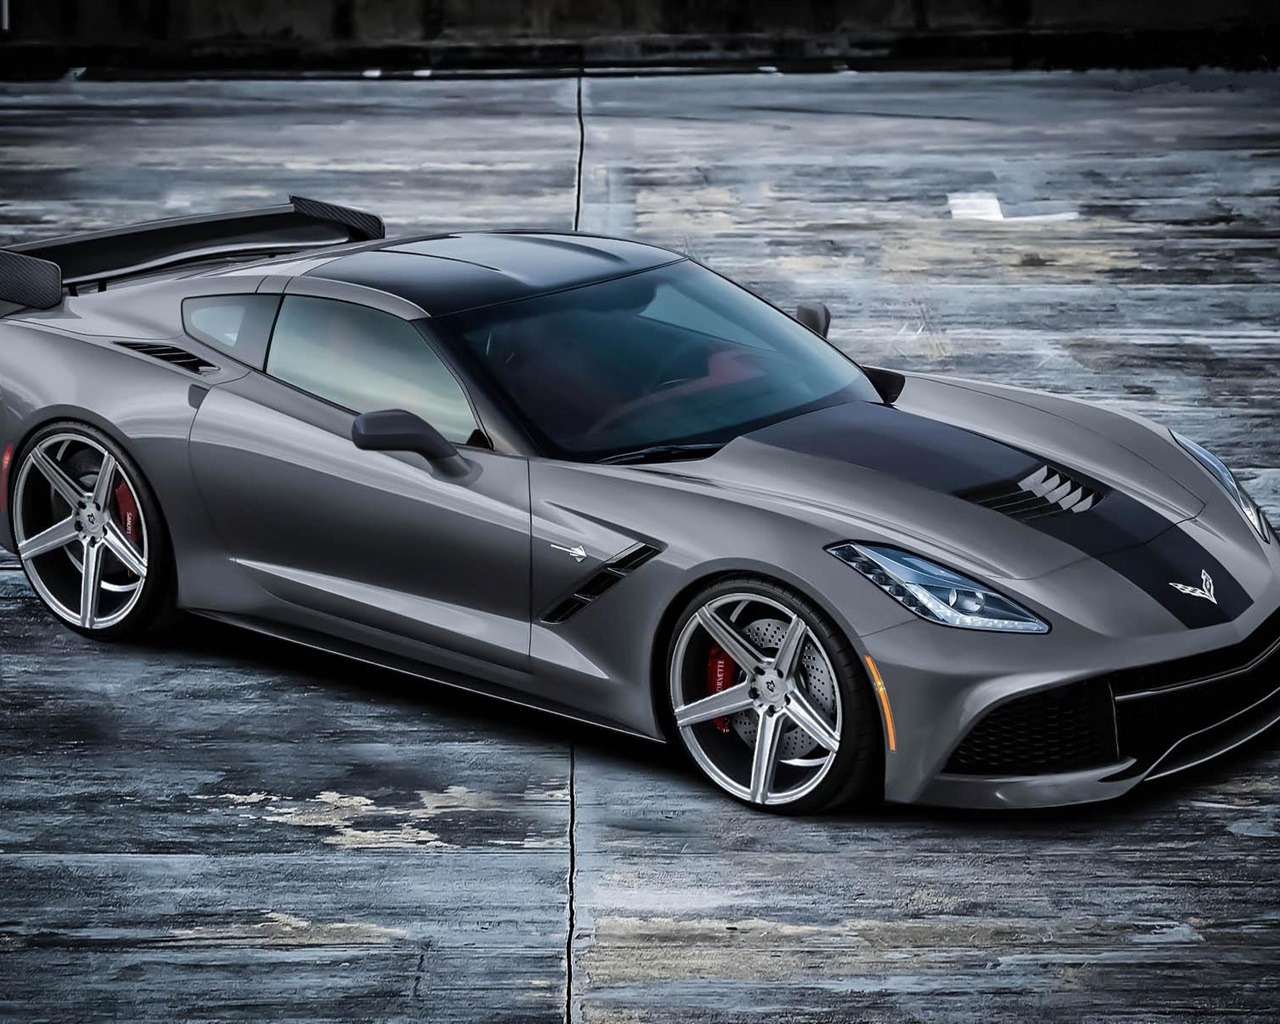 ... Corvette C7 Stingray grau supercar Hintergrundbilder - 1280x1024